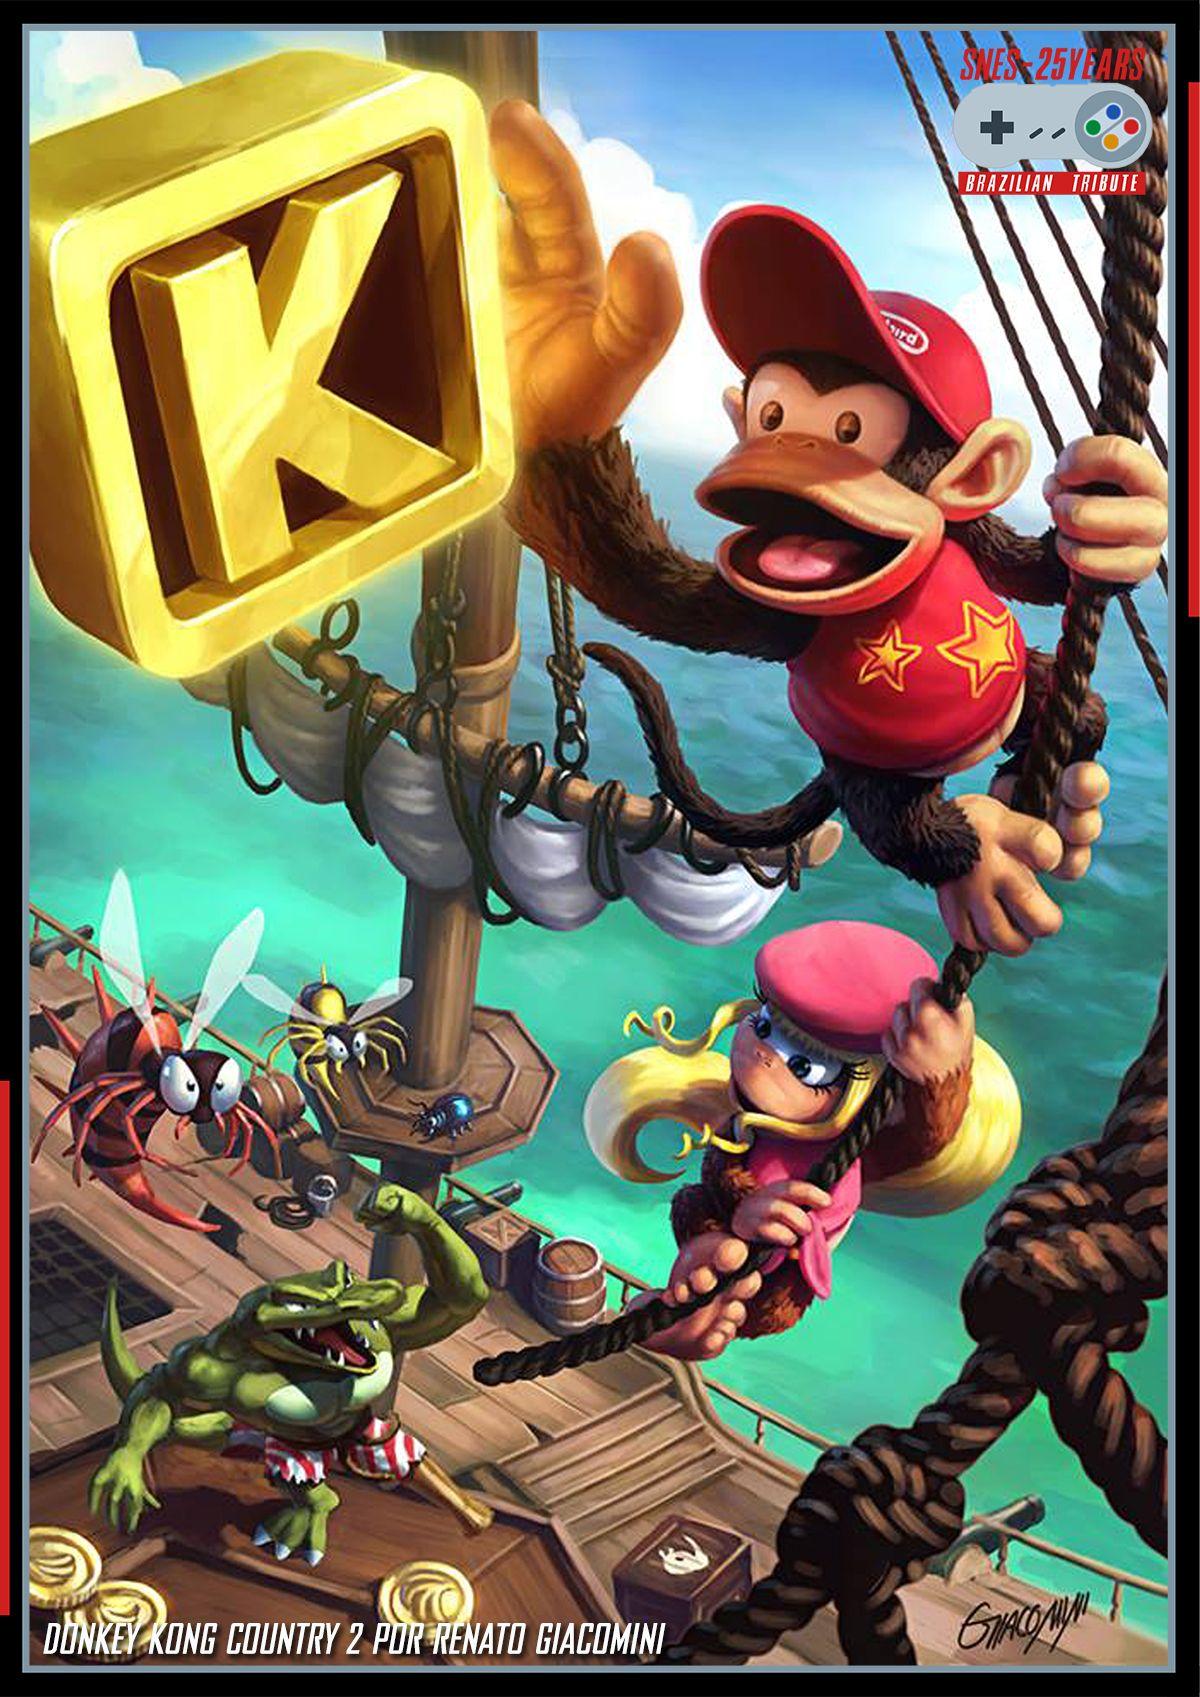 Pin By Justin Crady On Gaming Donkey Kong Donkey Kong Country